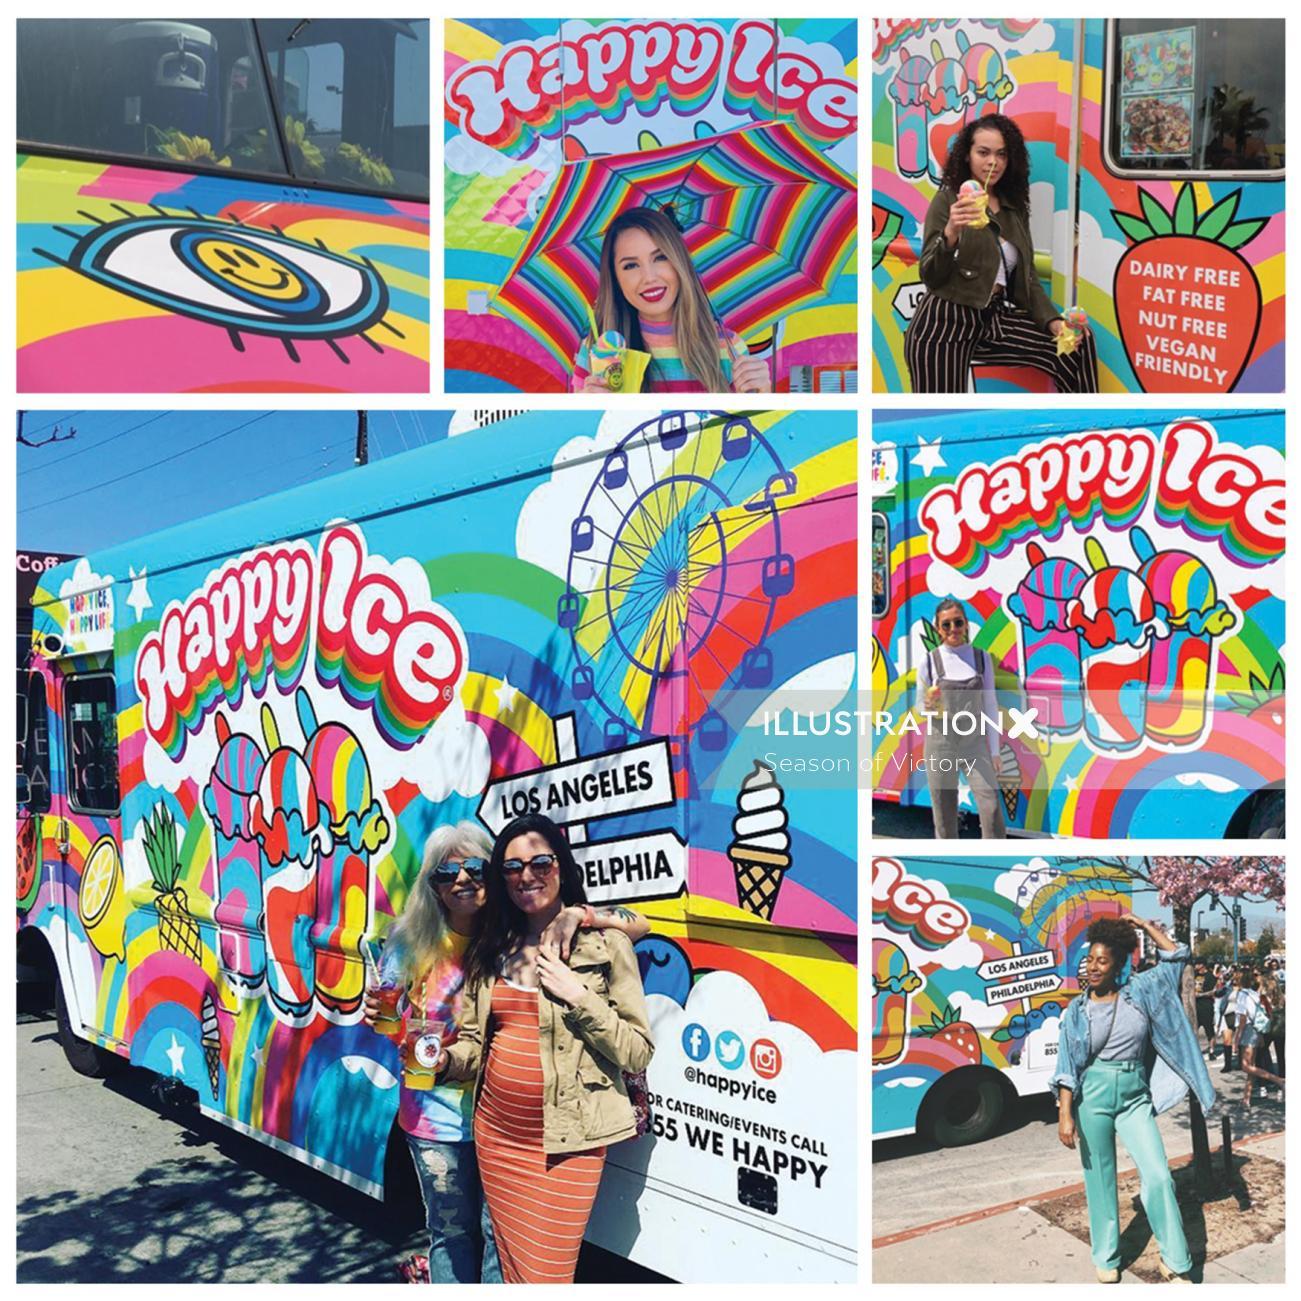 Mural art of happy ice life in Los Angeles